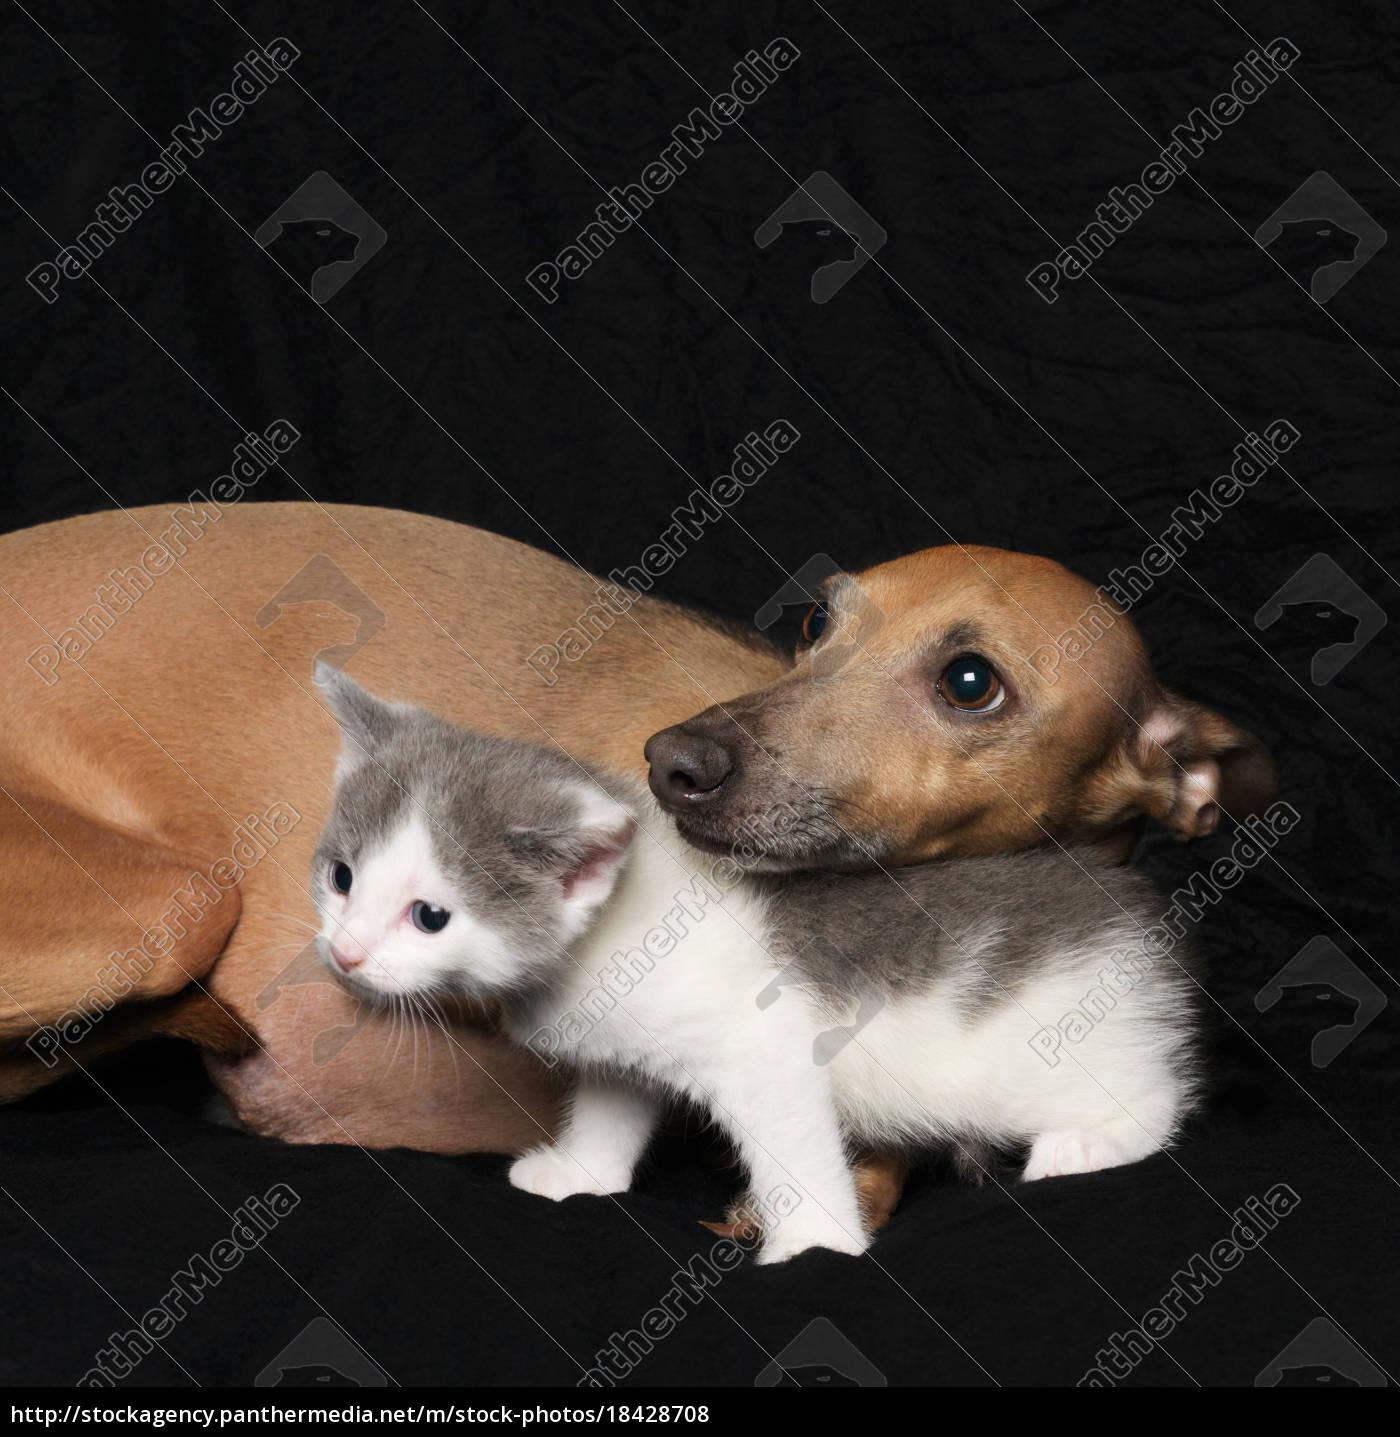 gattino, e, cane, su, sfondo, nero - 18428708